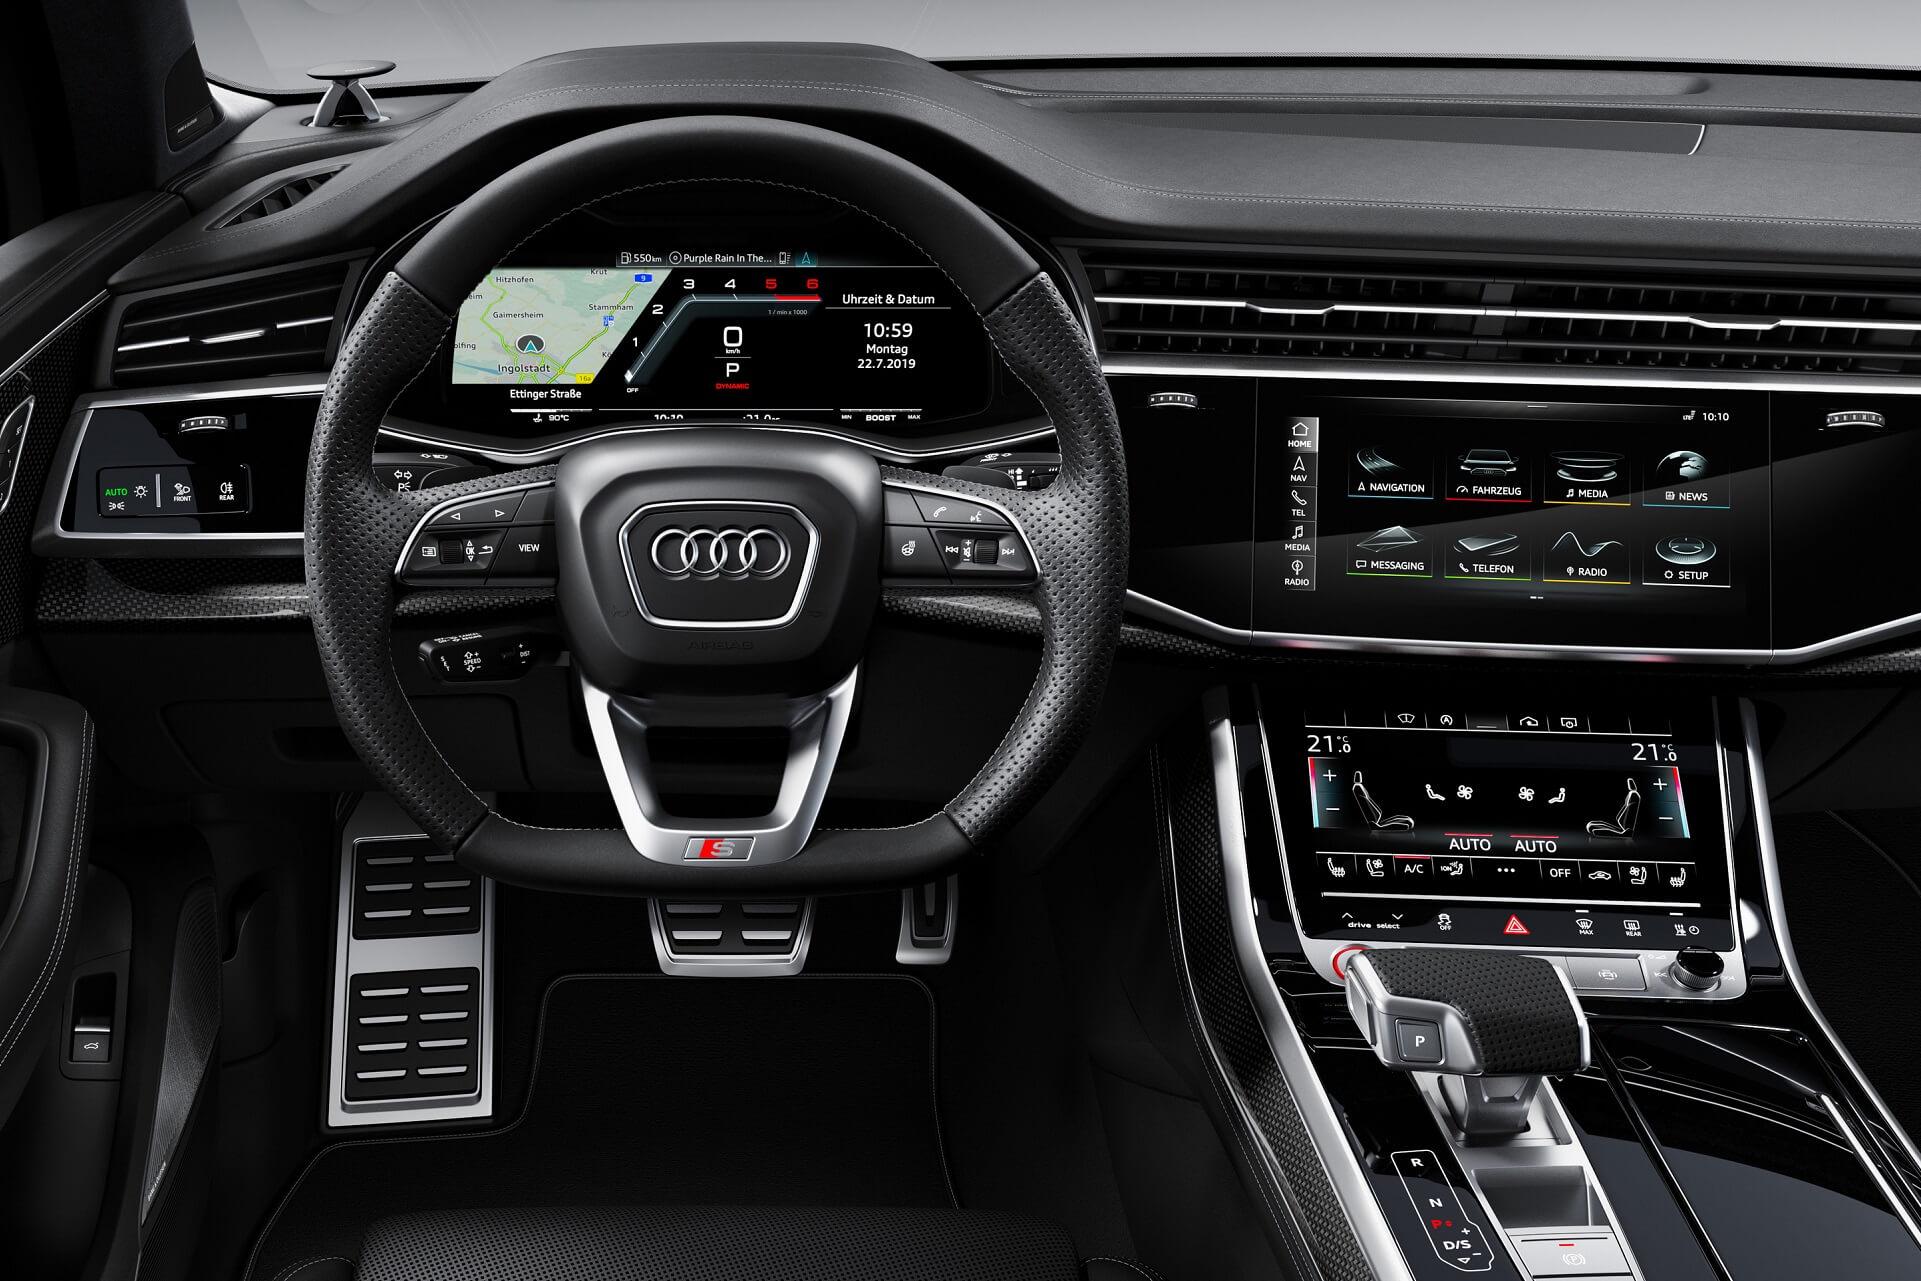 Audi Functions on Demand - Λειτουργίες κατά Παραγγελία μετά την αγορά του αυτοκινήτου